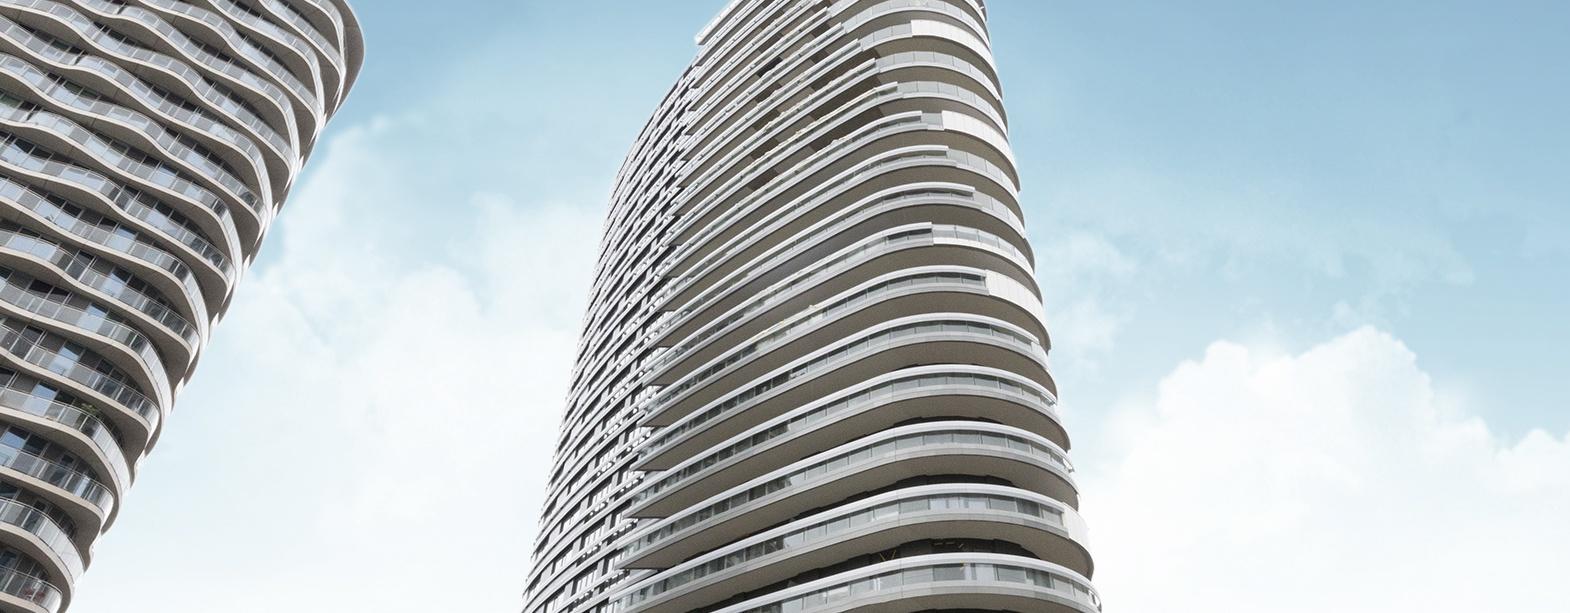 Gateway Tower image